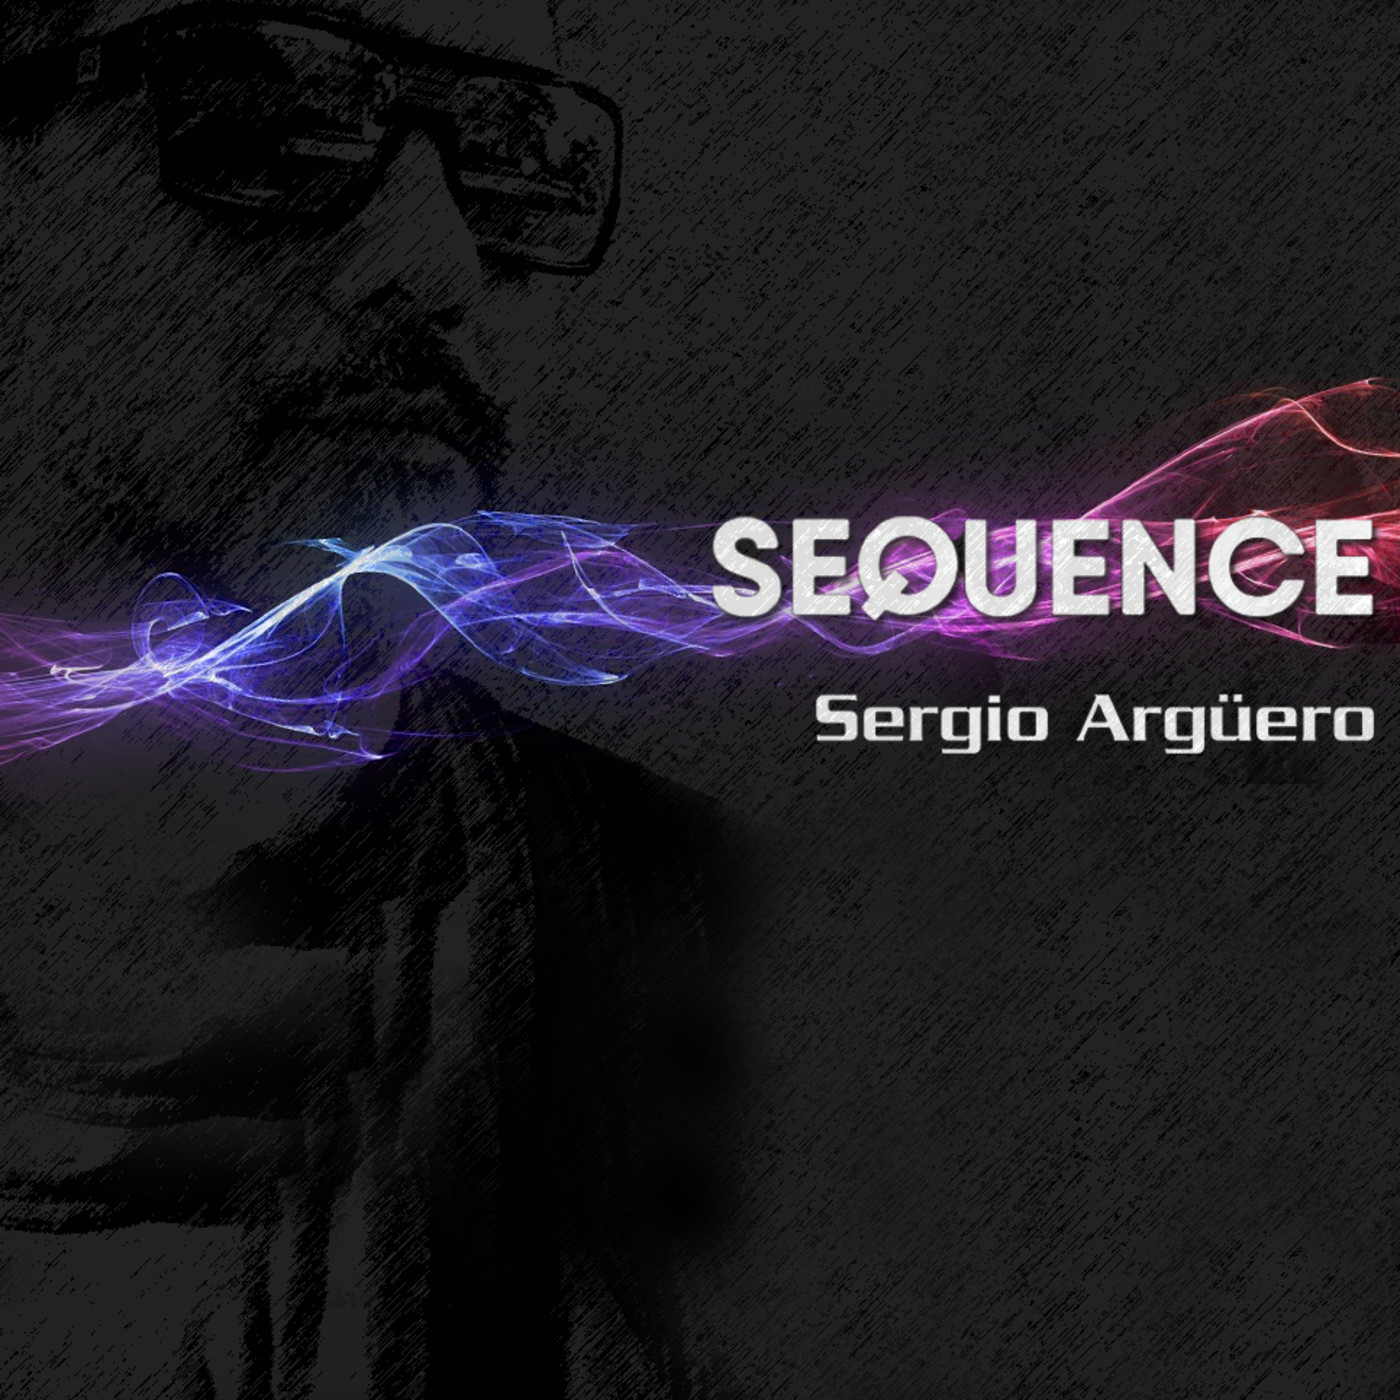 <![CDATA[Sequence with Sergio Argüero]]>